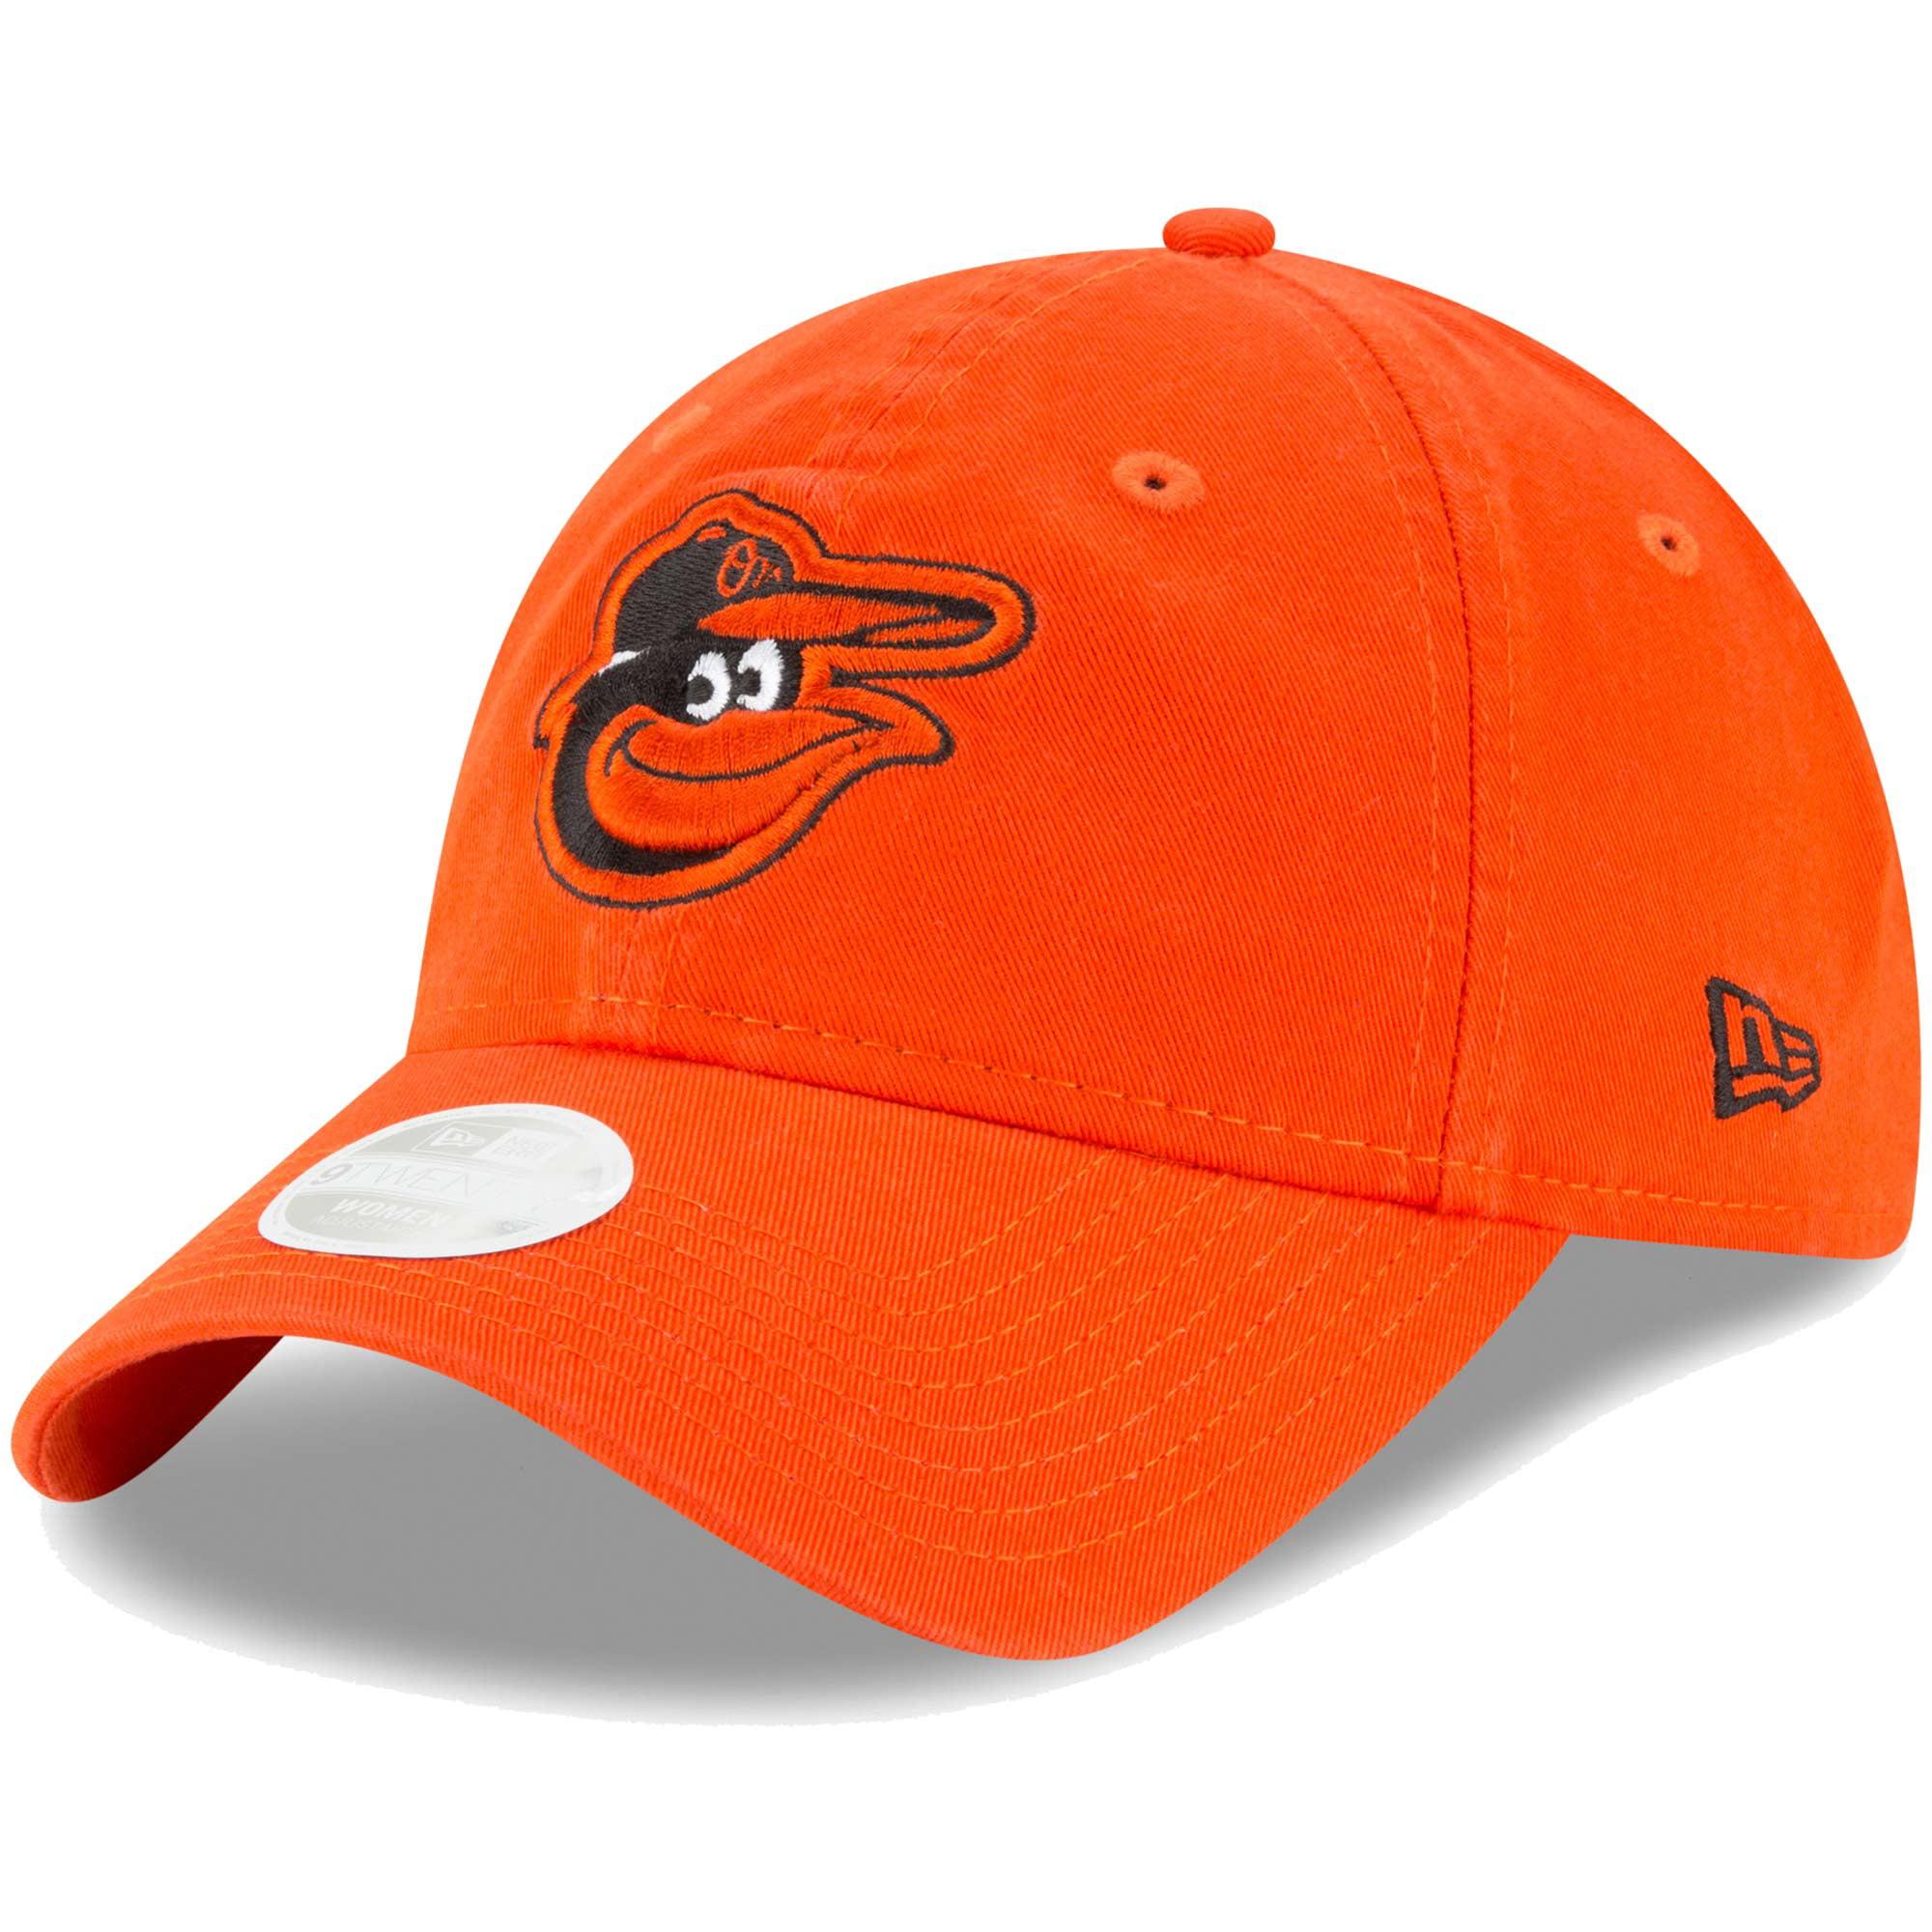 Baltimore Orioles New Era Women's Core Classic Twill Team Color 9TWENTY Adjustable Hat - Orange - OSFA